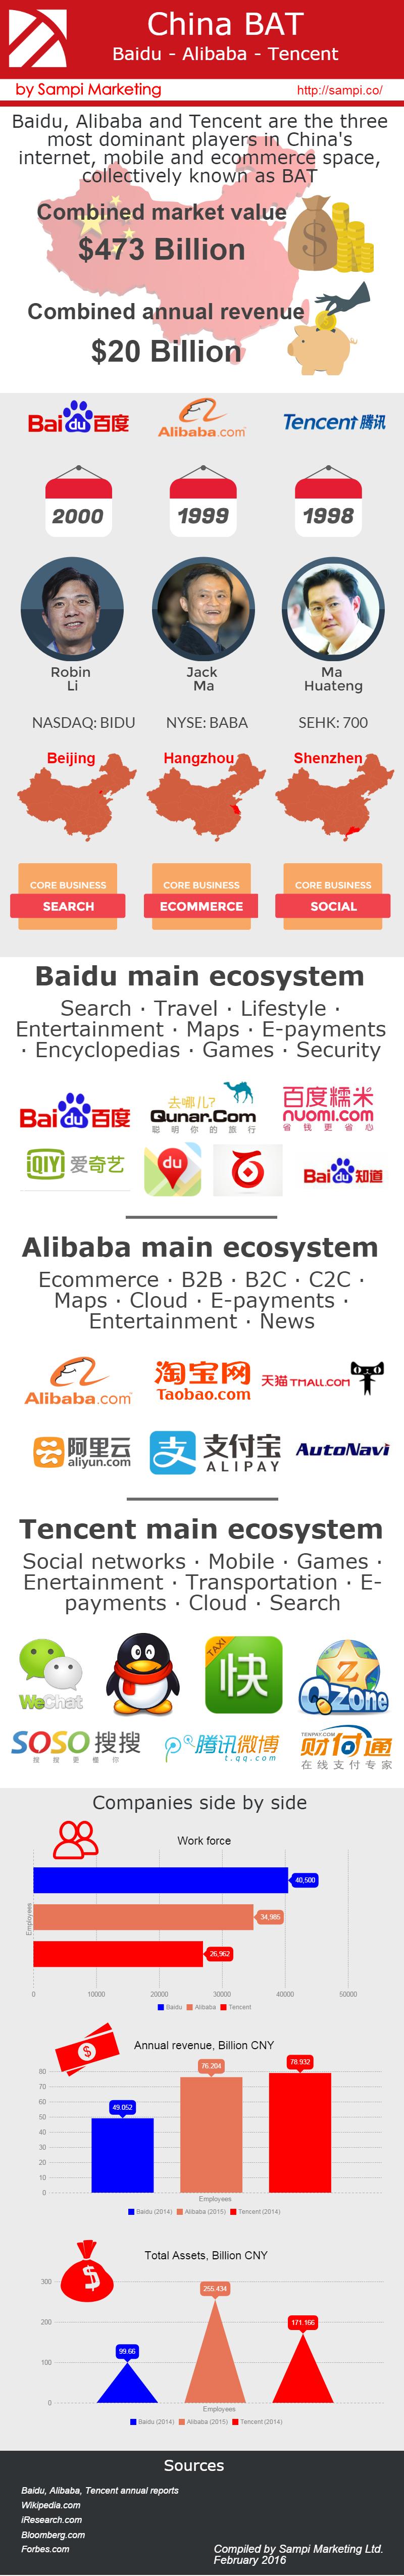 Infographic on China BAT - Baidu Alibaba Tencent | Sampi.co